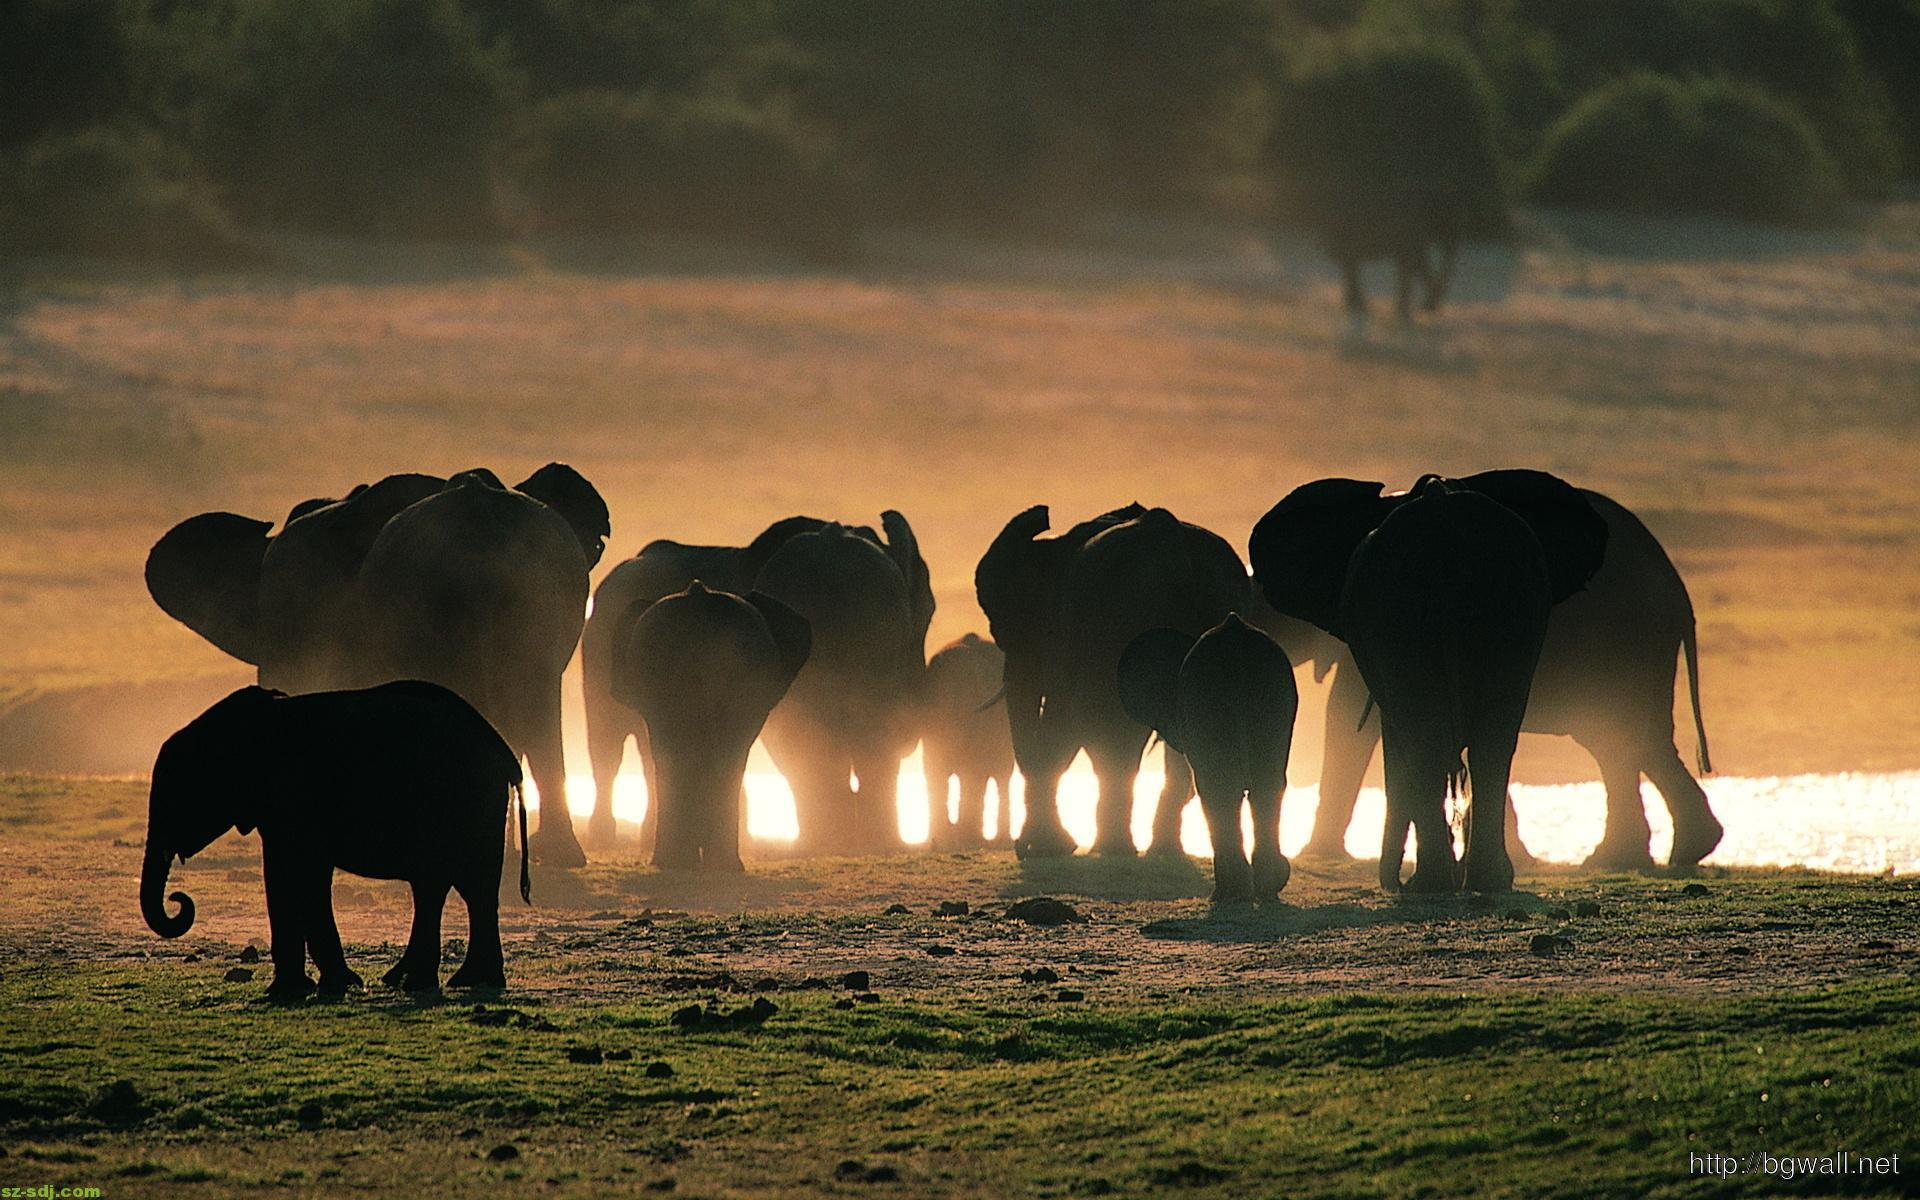 big-elephants-family-wallpaper